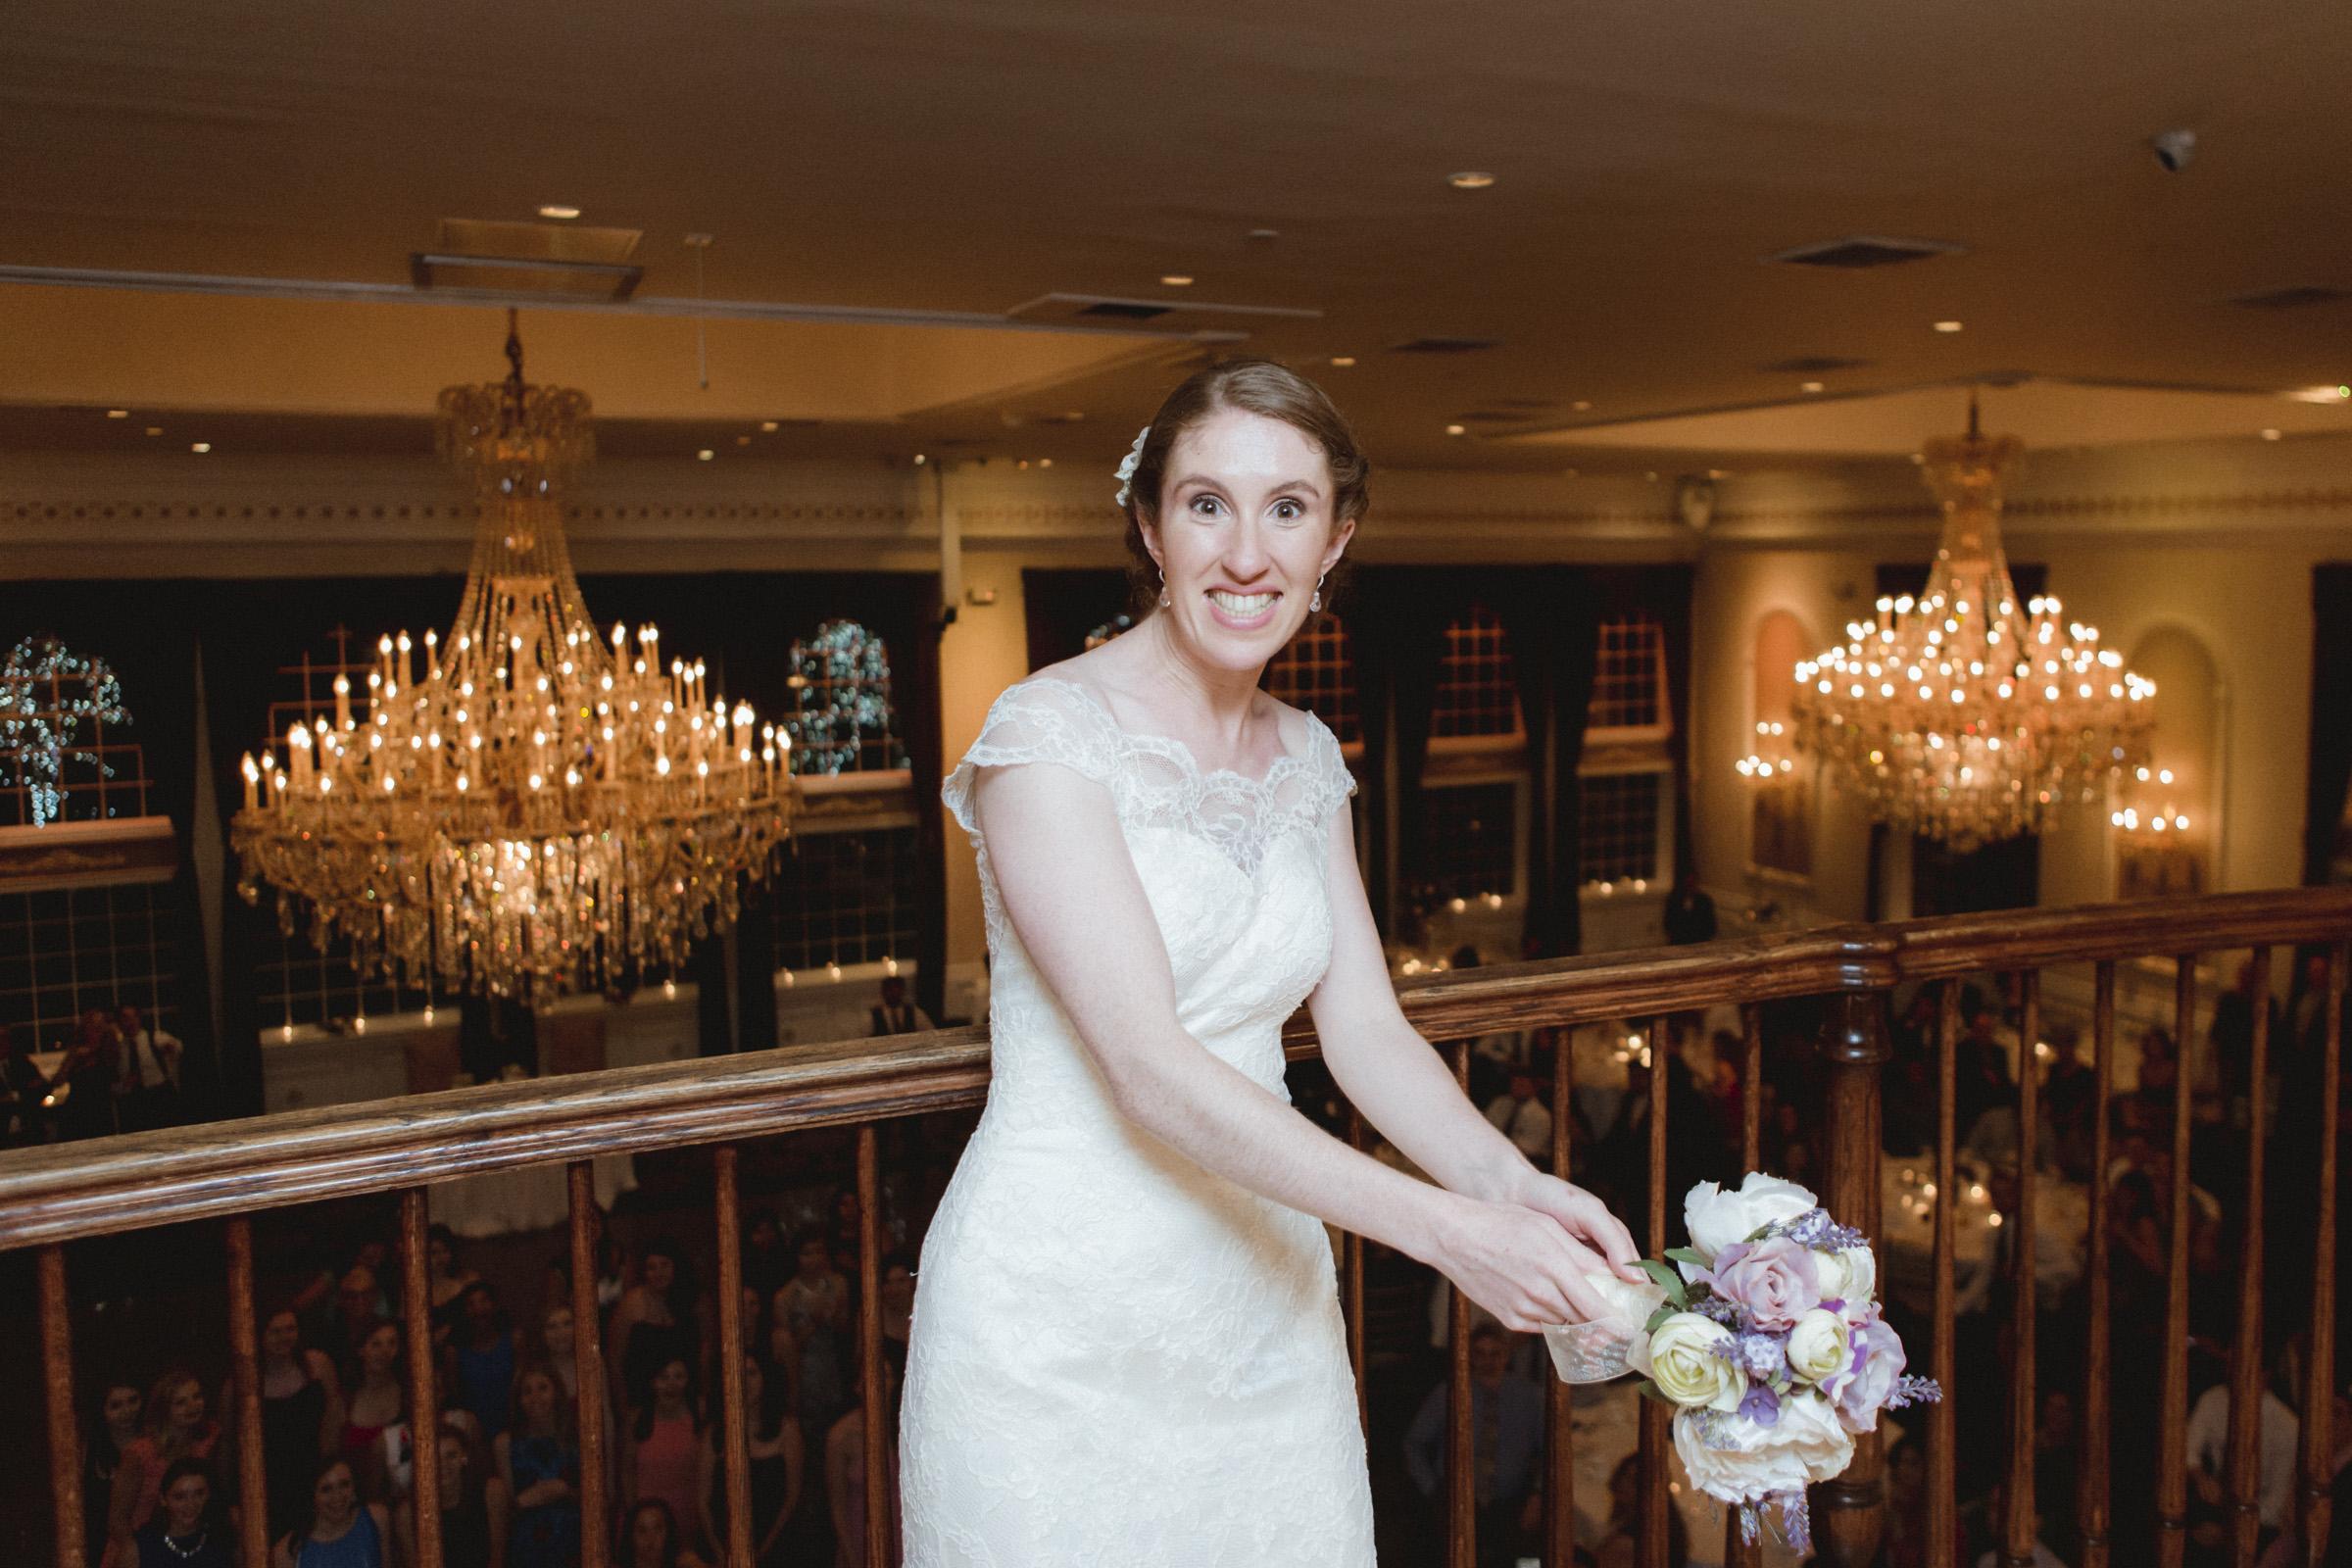 Bride prepares to throw her bouquet - Estate at Florentine Gardens wedding - Hudson Valley Wedding - Kelsey & Anish's wedding - Amy Sims Photography